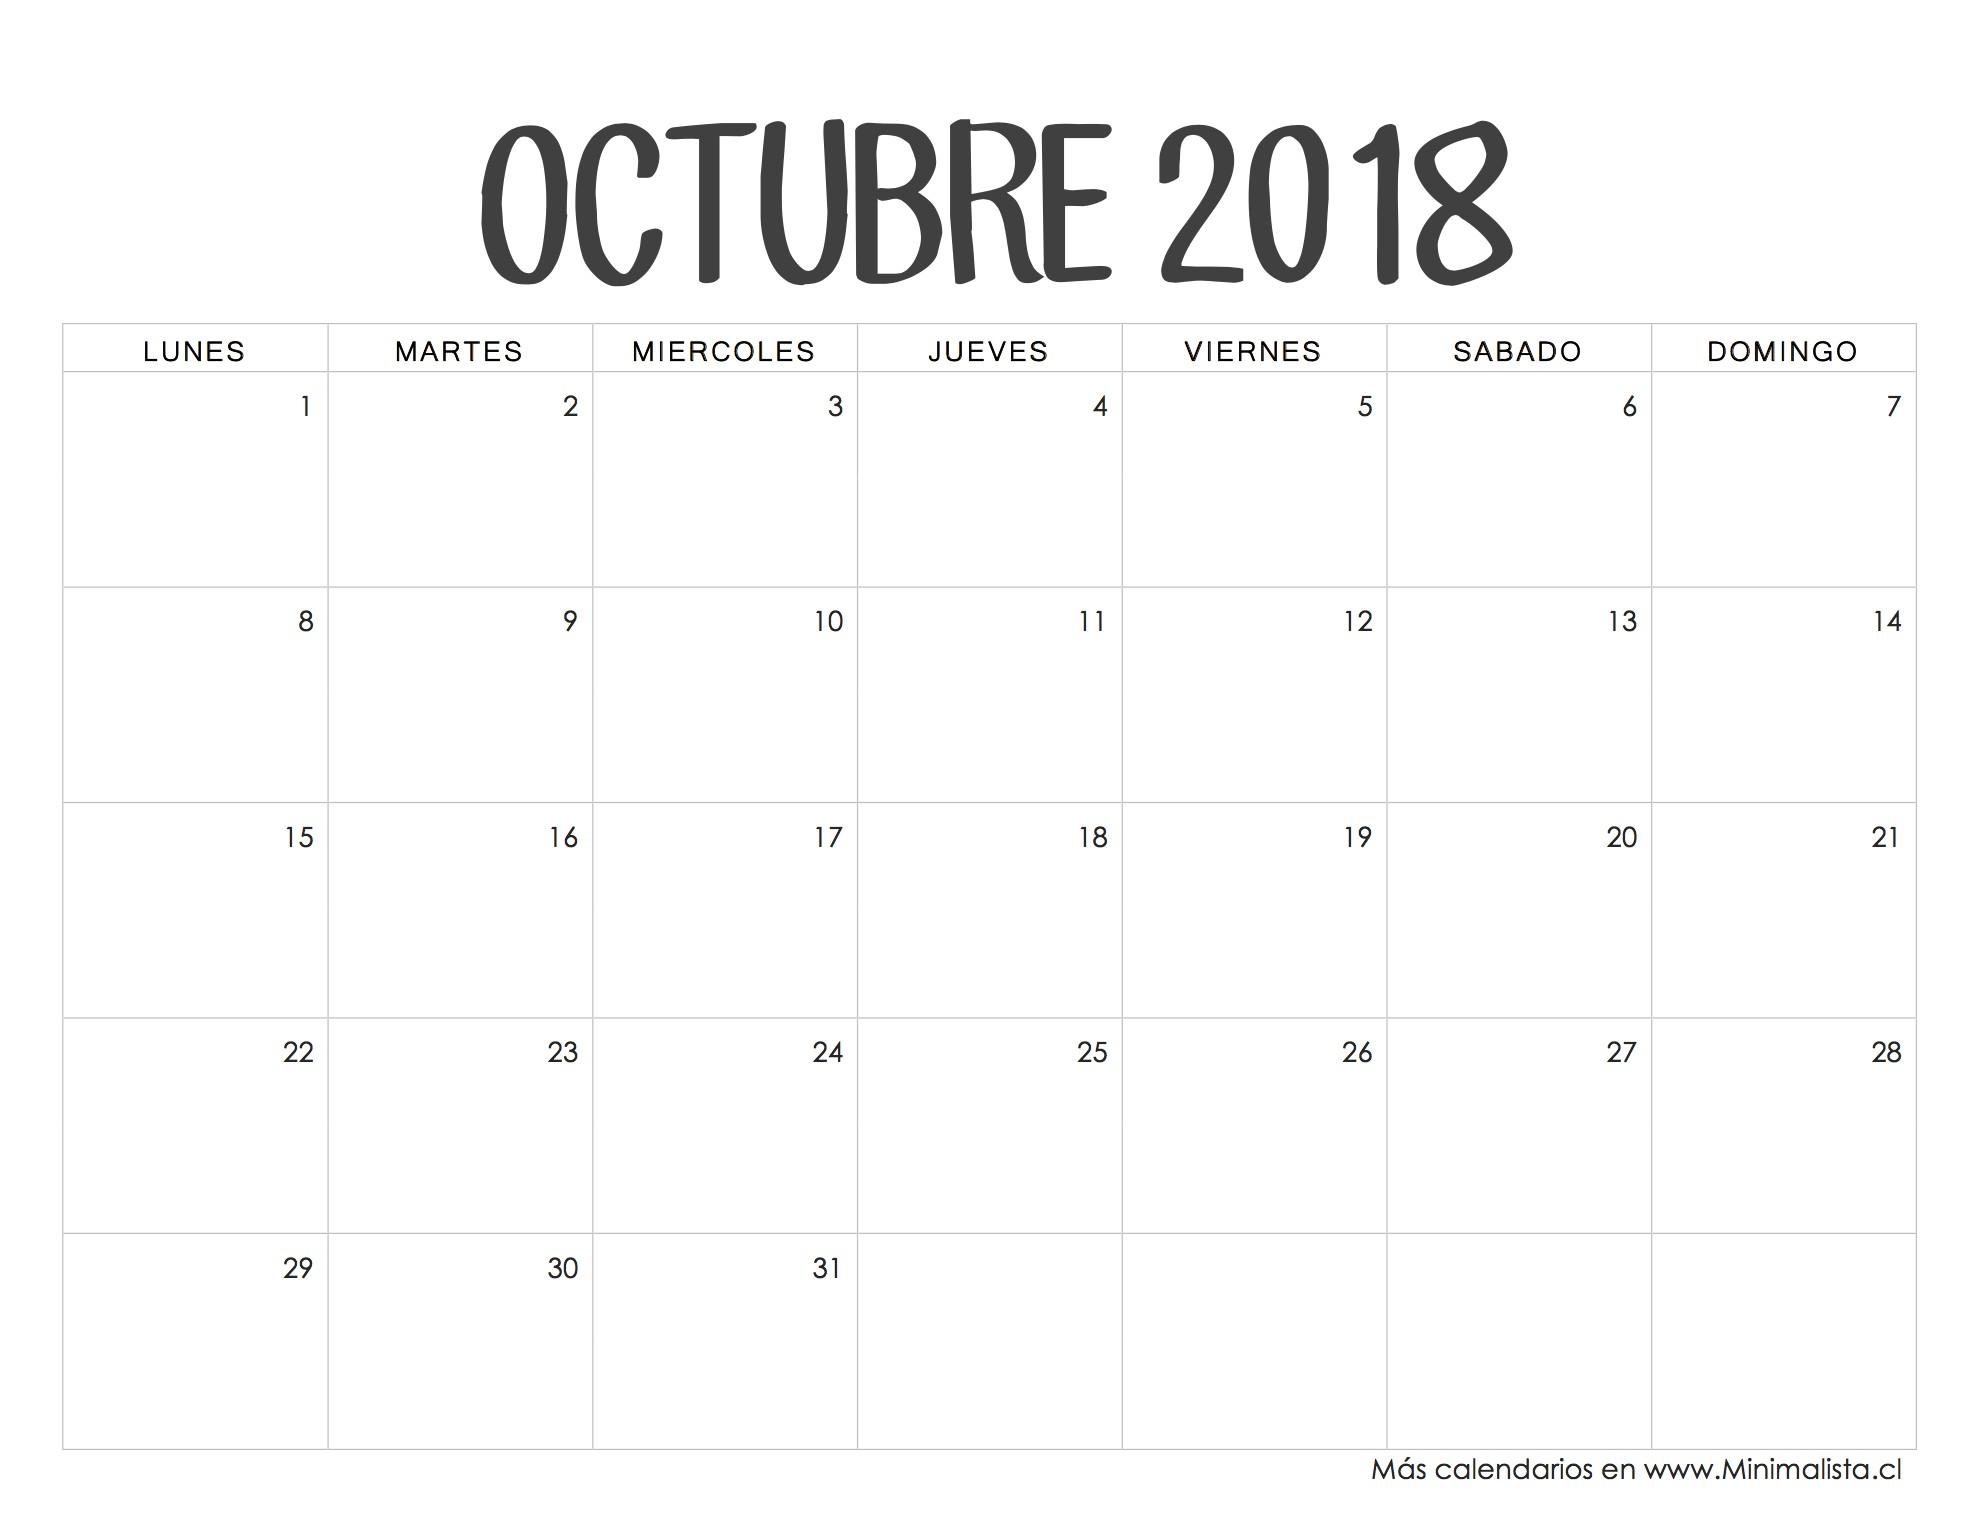 Calendario 2019 Chile Para Imprimir Chile Más Populares Calendario Octubre 2018 organizarme Of Calendario 2019 Chile Para Imprimir Chile Más Arriba-a-fecha Calendario Agosto 2018 Desk Ideas Pinterest